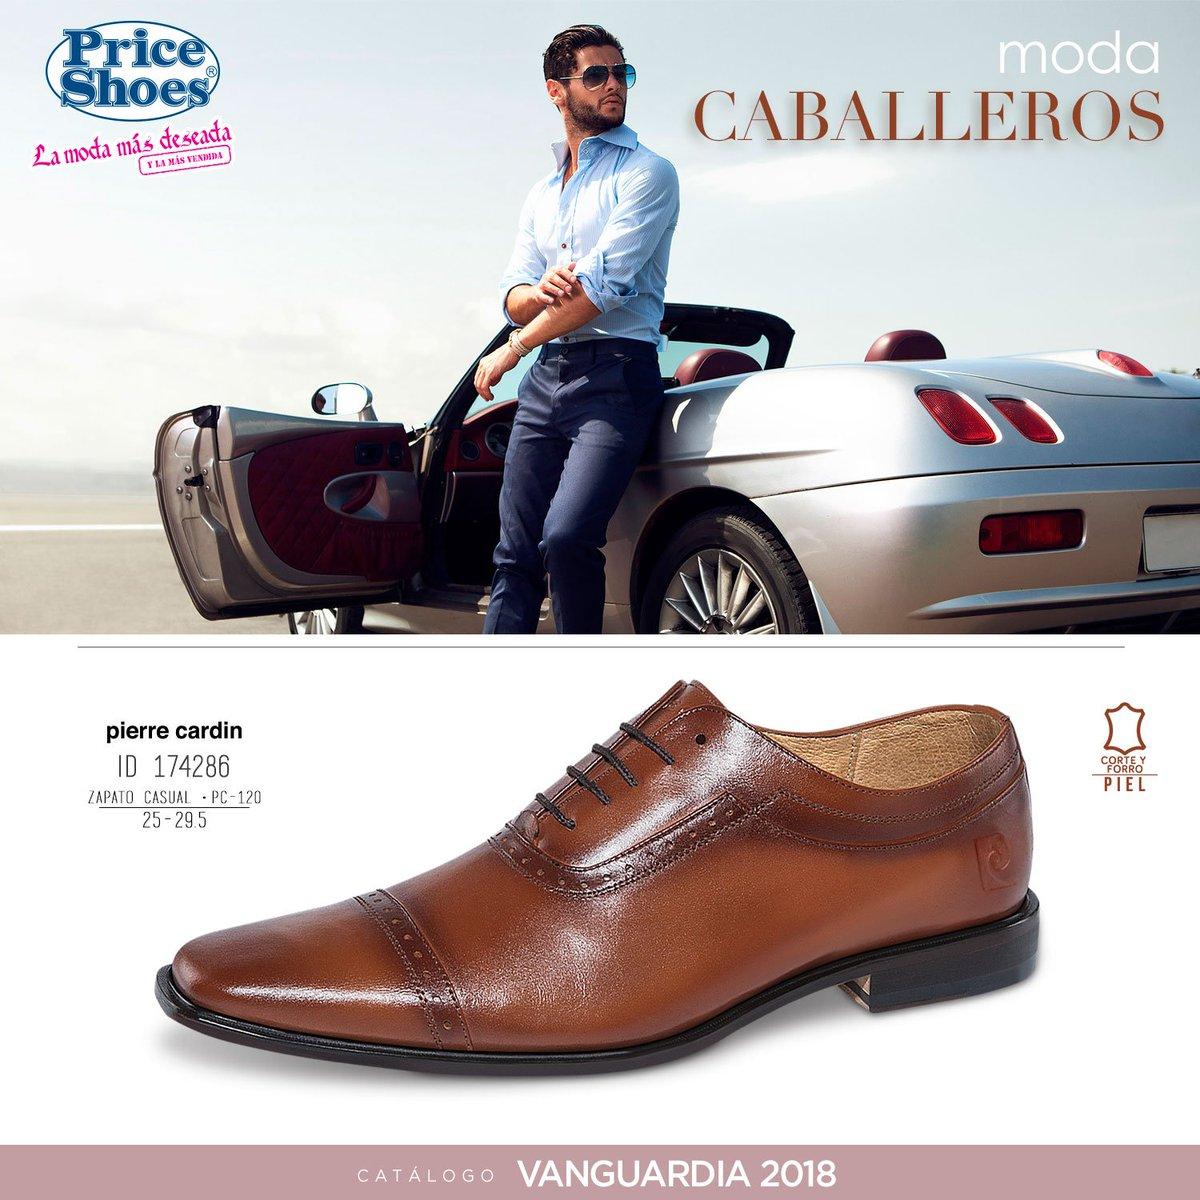 0e38a4e6 on un bien de cuidado Shoes habla Un hombre Price Twitter calzado zF5Sqw